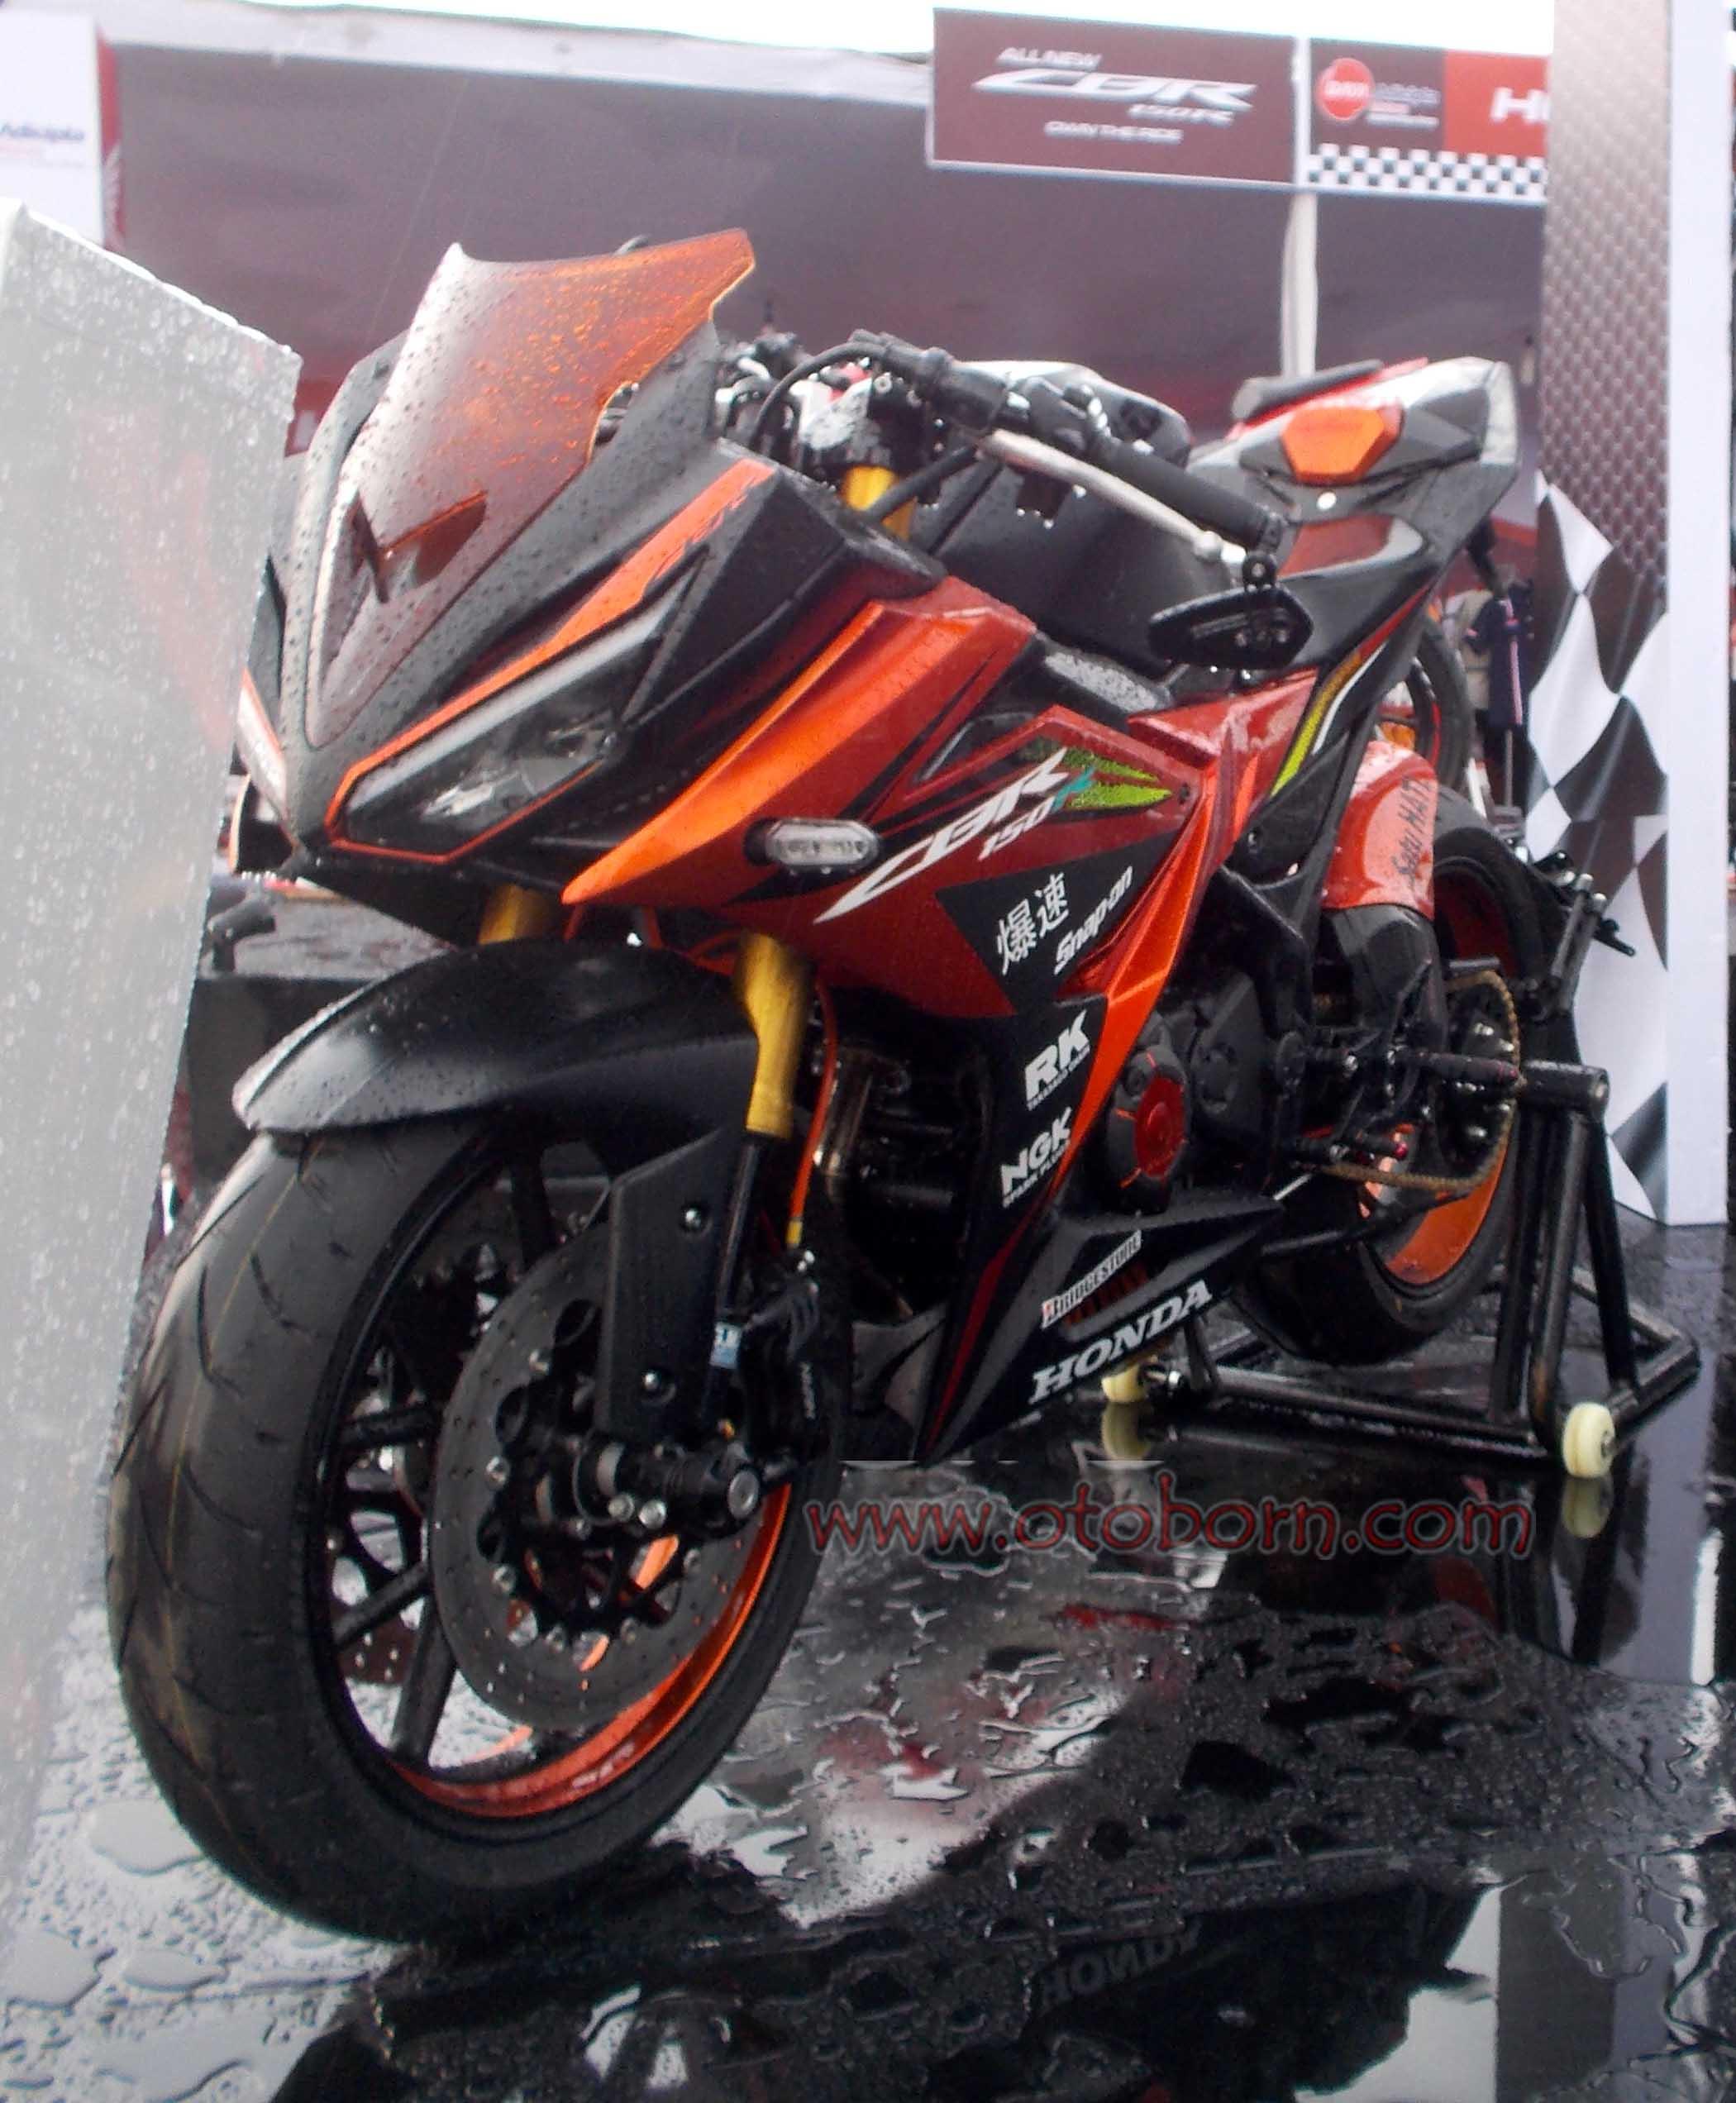 Koleksi Ide 77 Modifikasi Motor Honda New Cbr 150 Terbaru Pojok